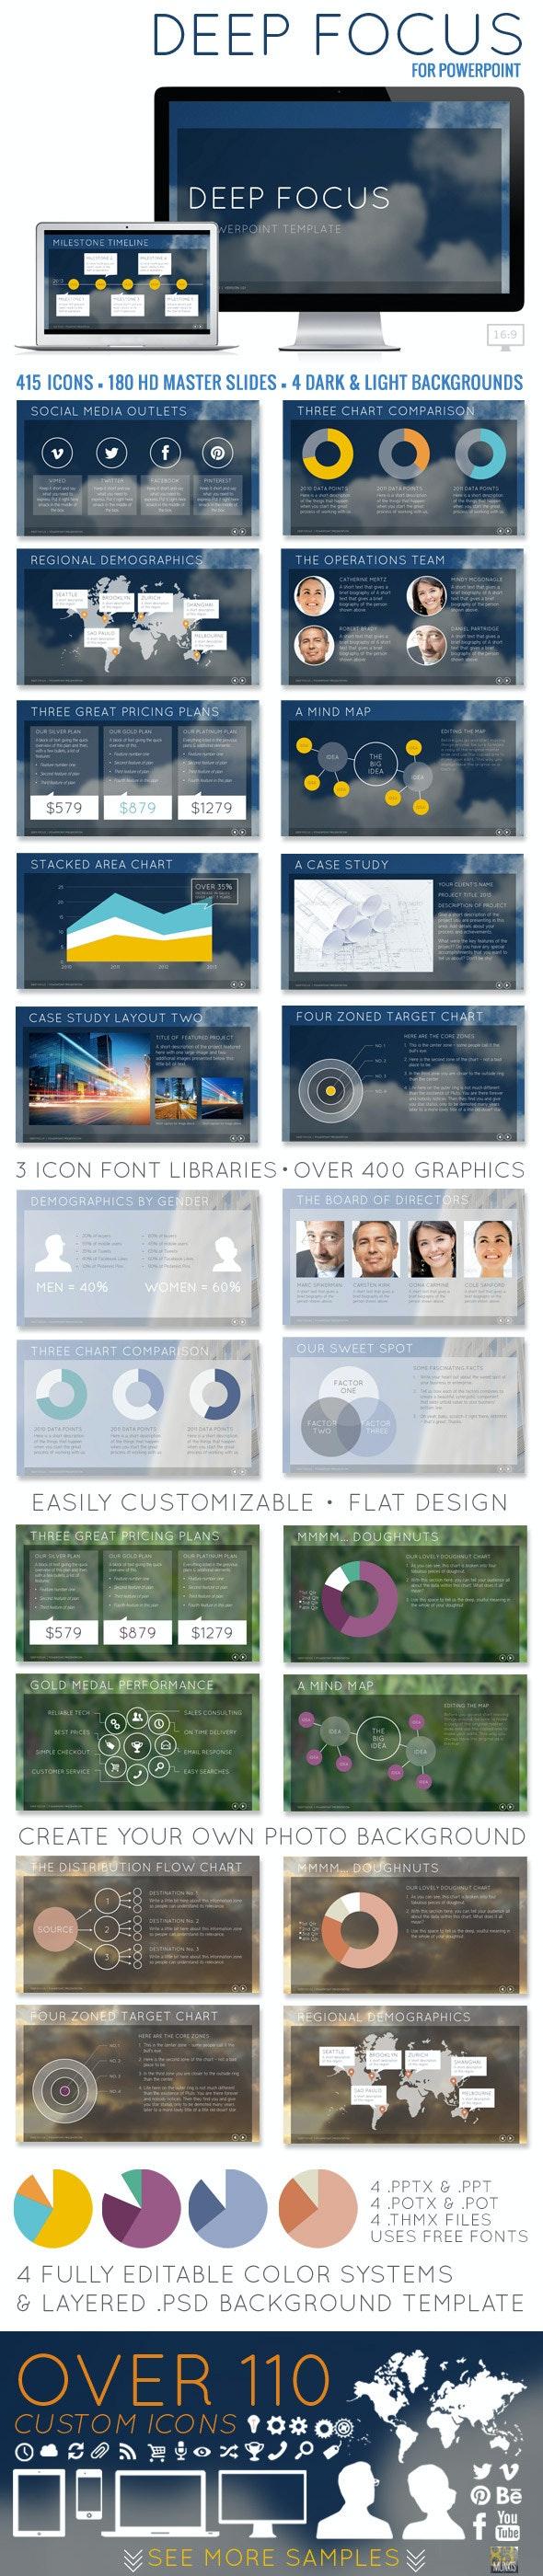 Deep Focus Powerpoint Presentation Template - Creative PowerPoint Templates